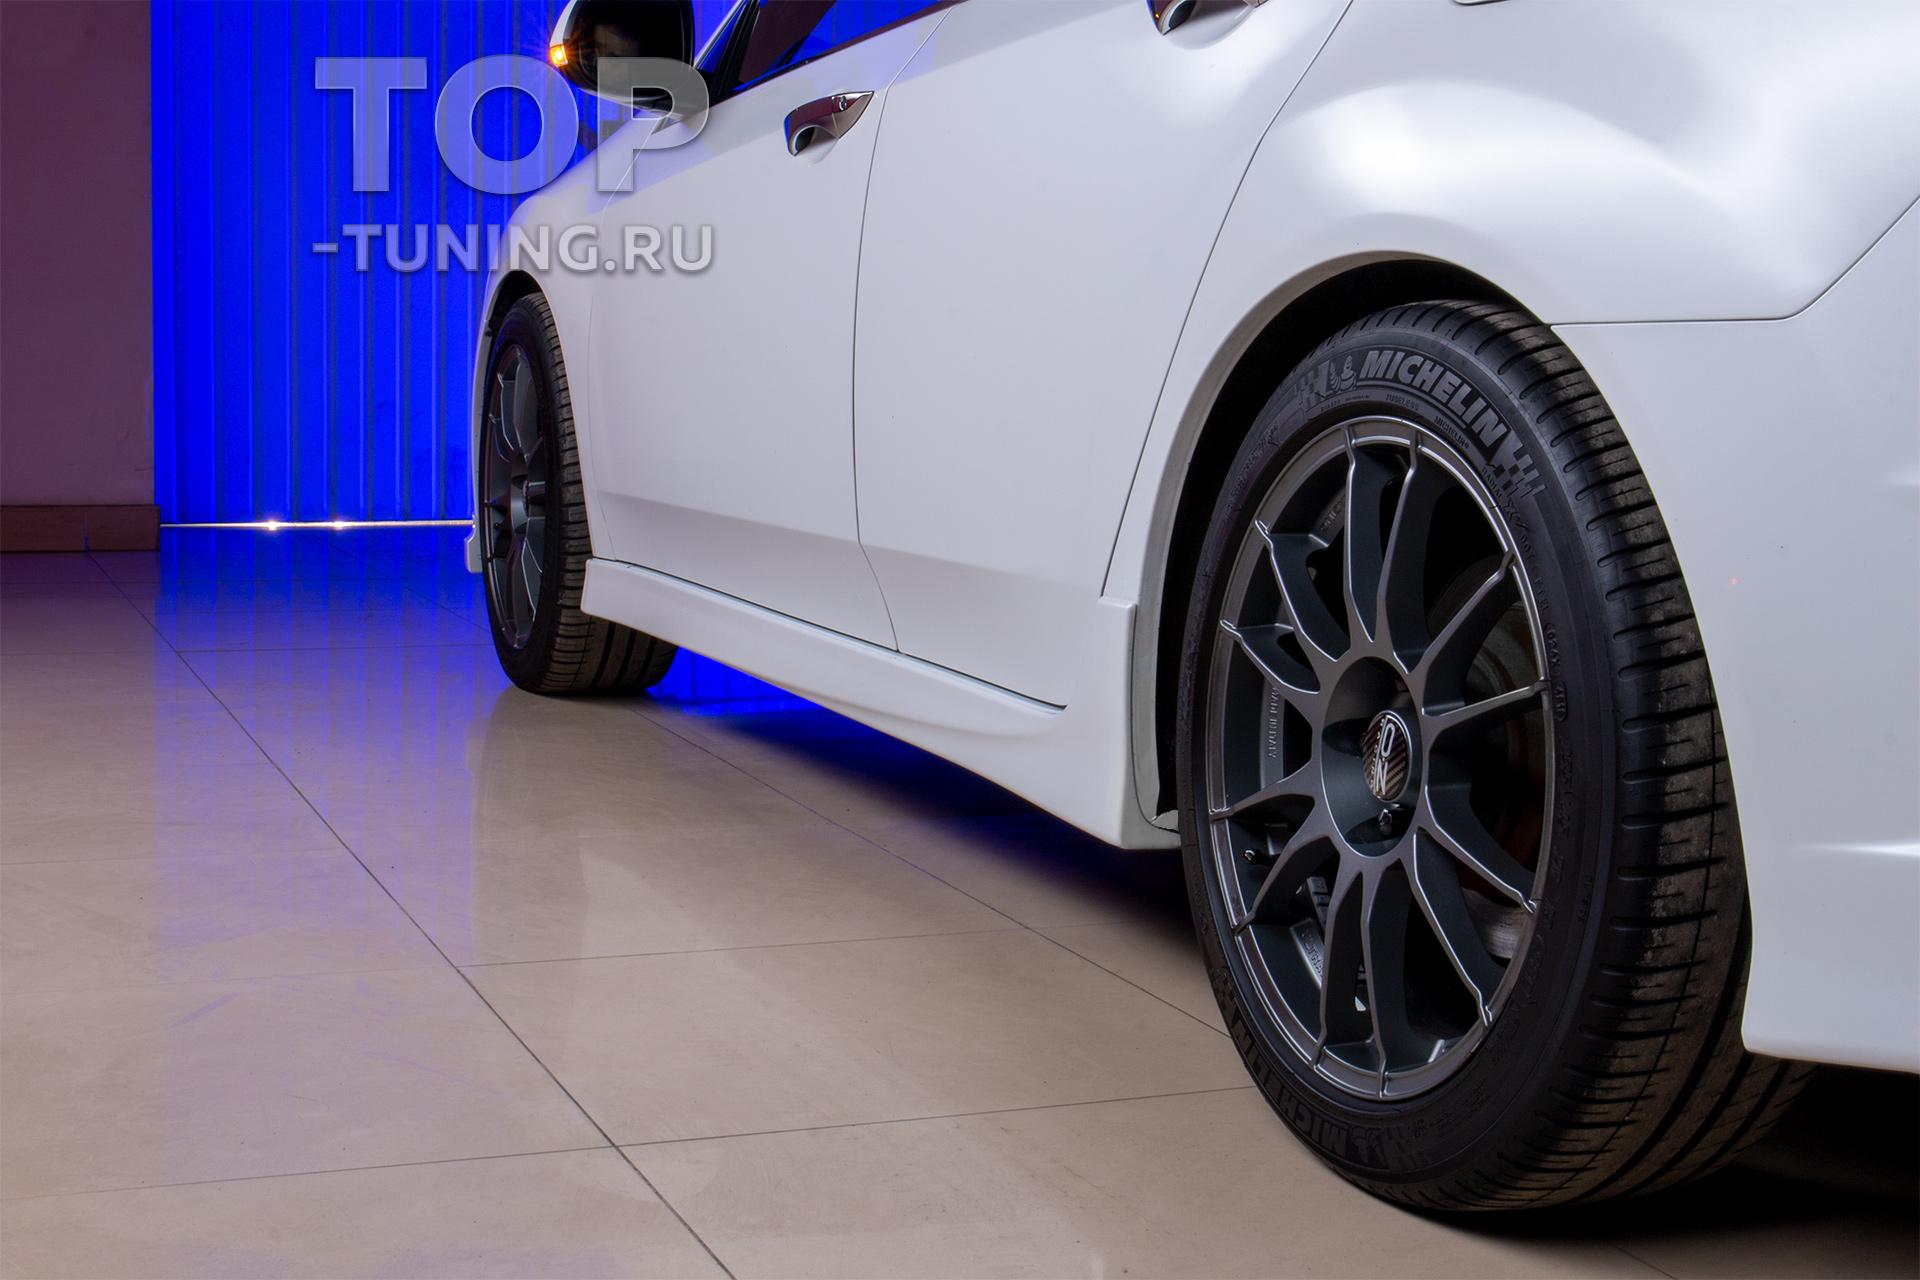 103714 Тюнинг для Honda Accord 8 в обвесе Modulo